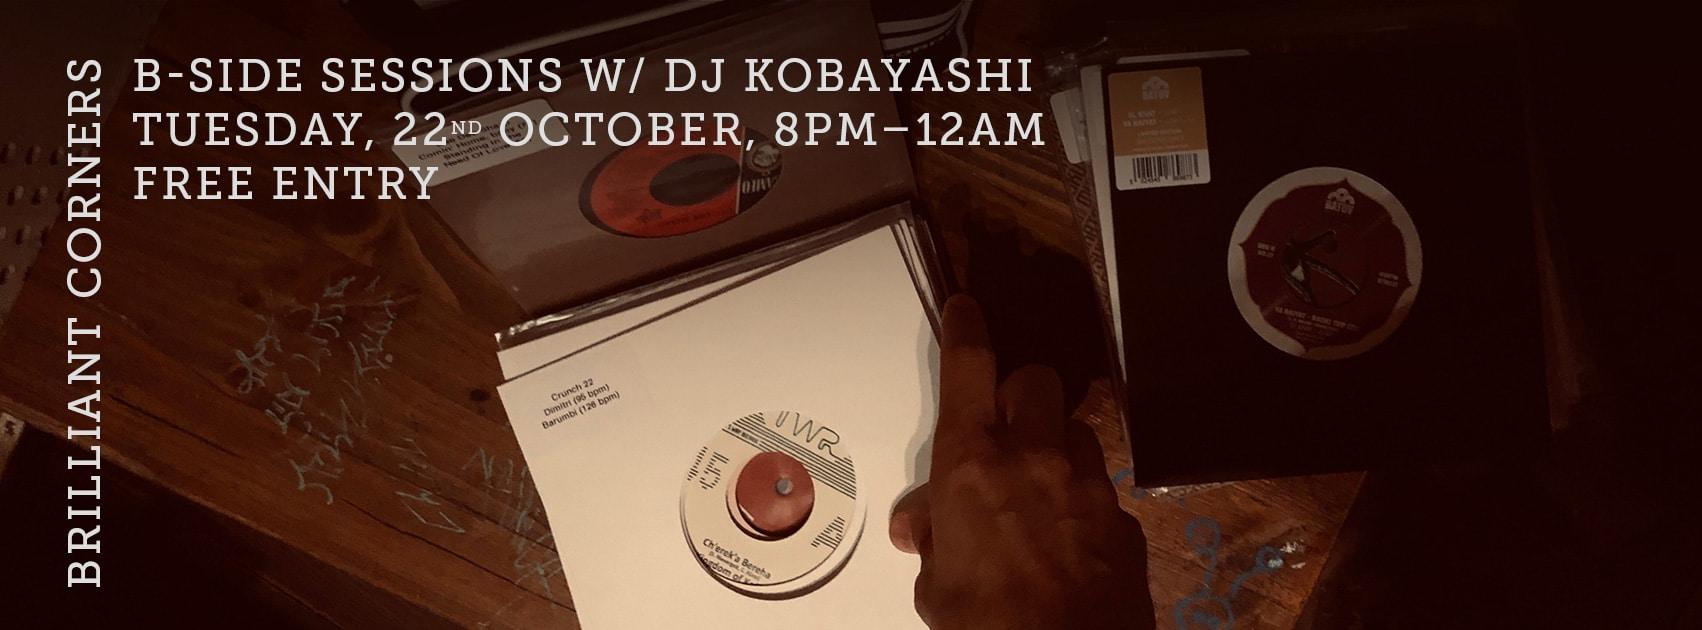 B-Side Sessions DJ Kobayashi Brilliant Corners